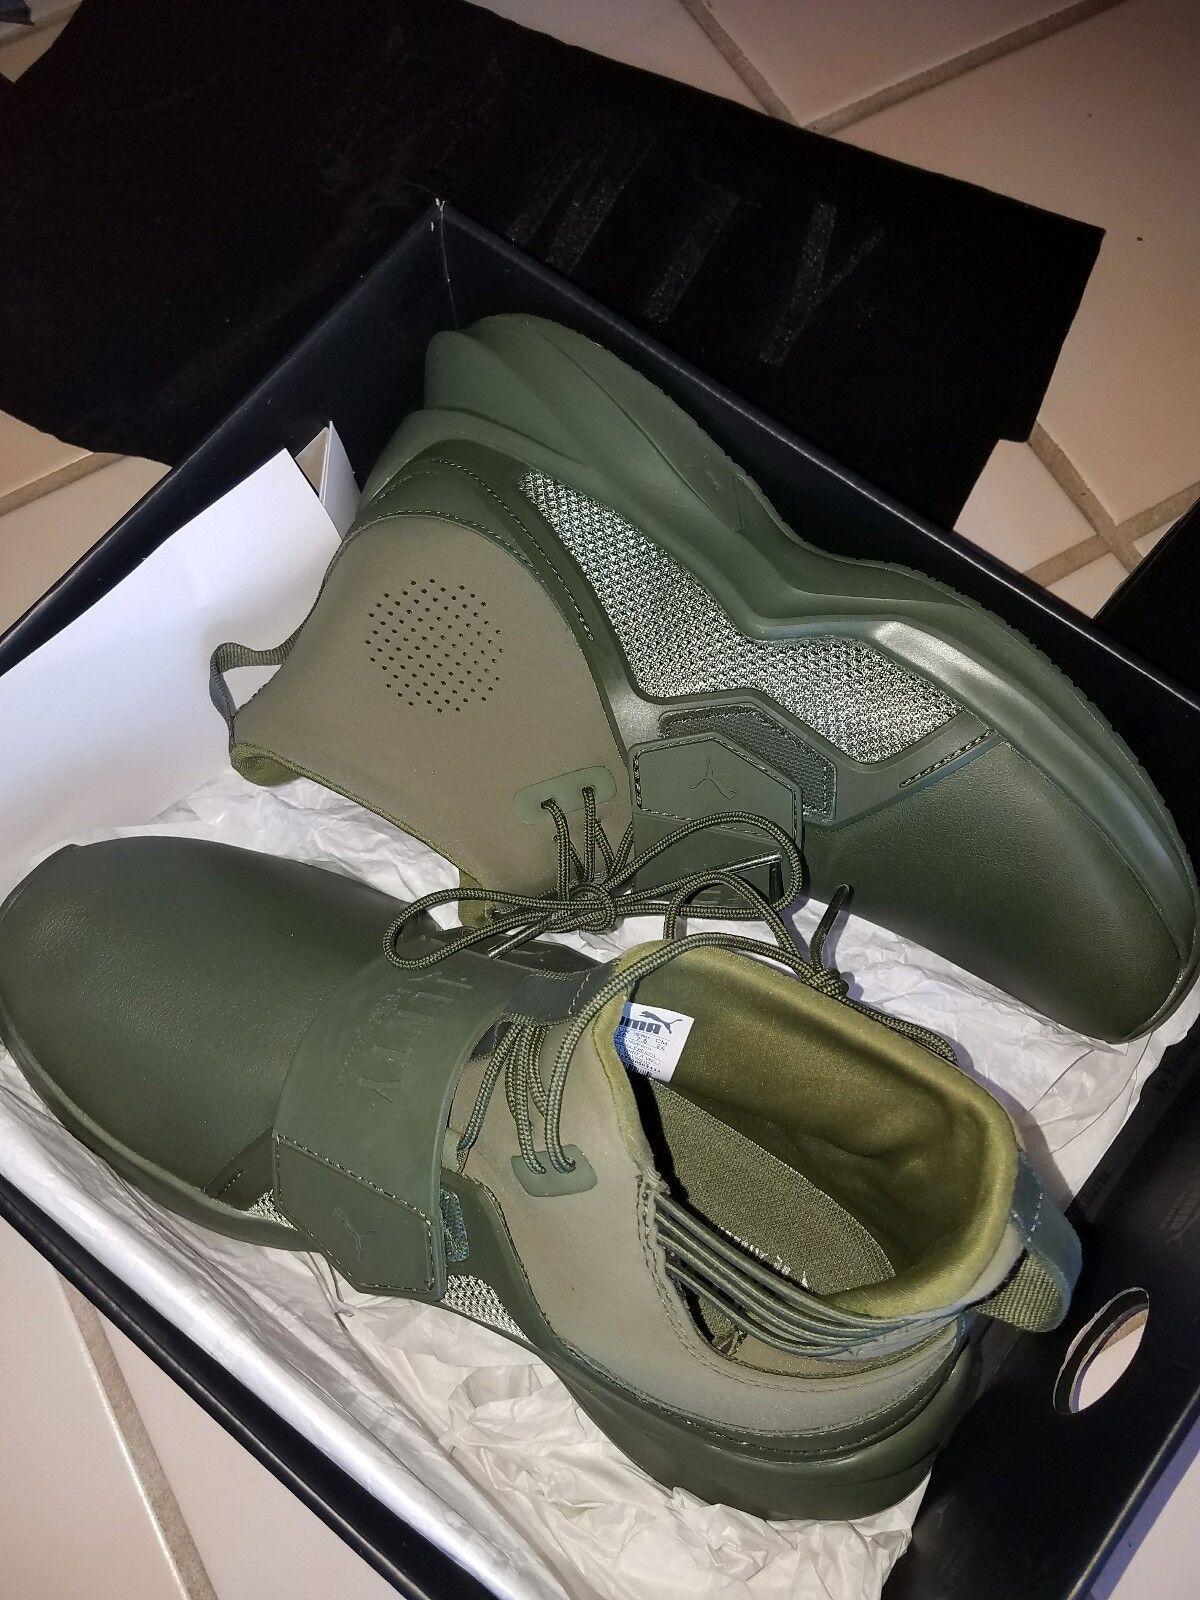 Nuove donne puma verde x fenty trainer cypress verde puma oliva rihanna sz 7,5 scarpe da tennis ab69b0